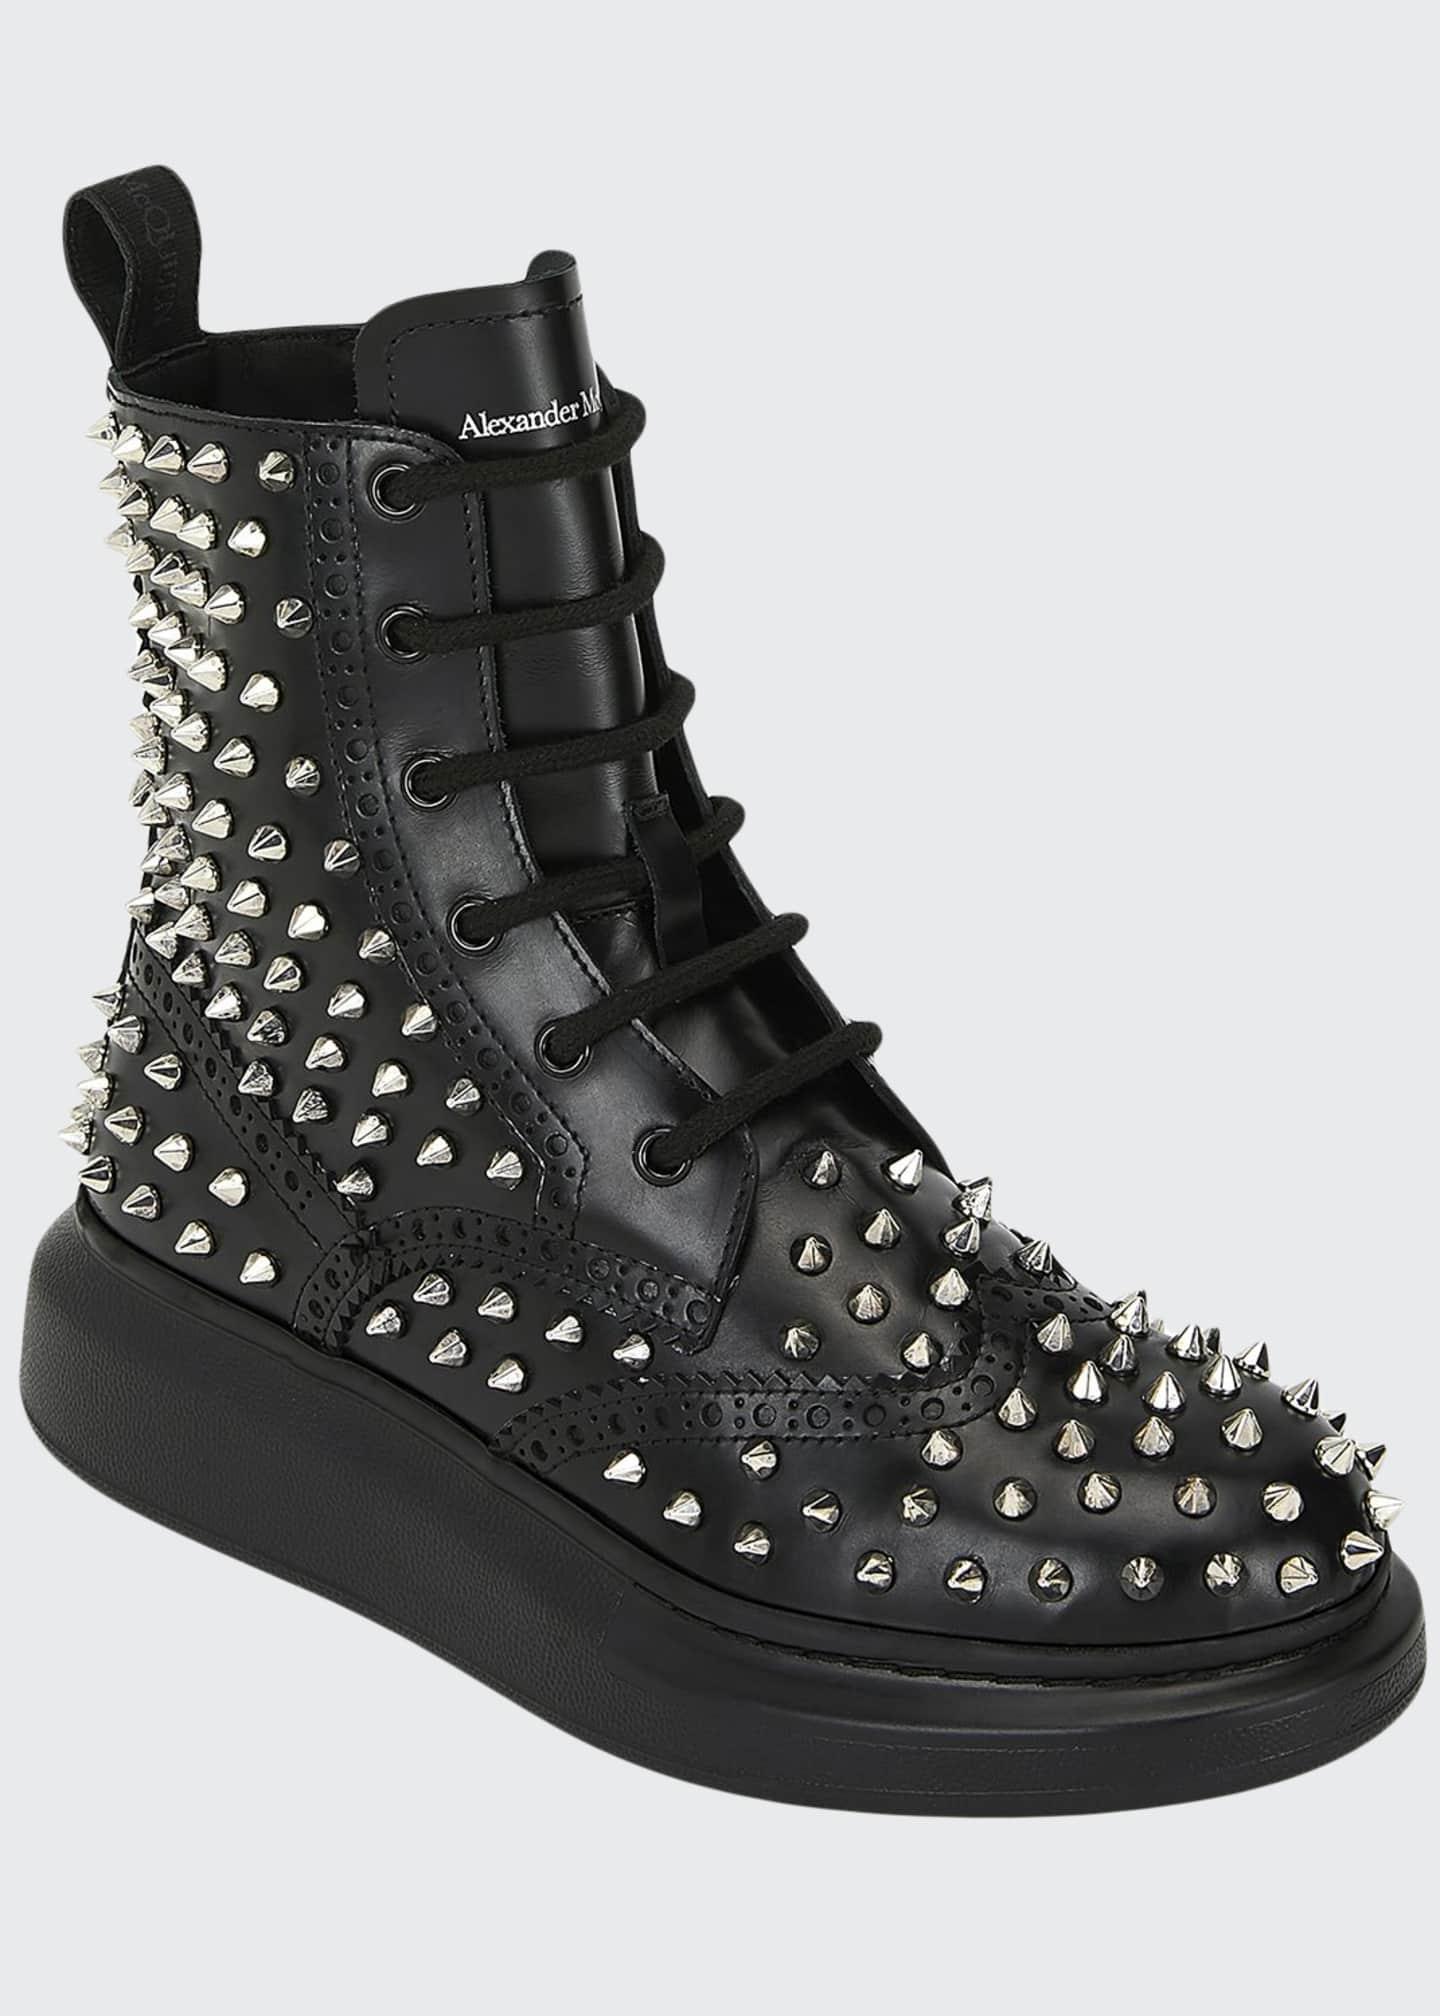 Alexander McQueen High-Top Spike Leather Boots